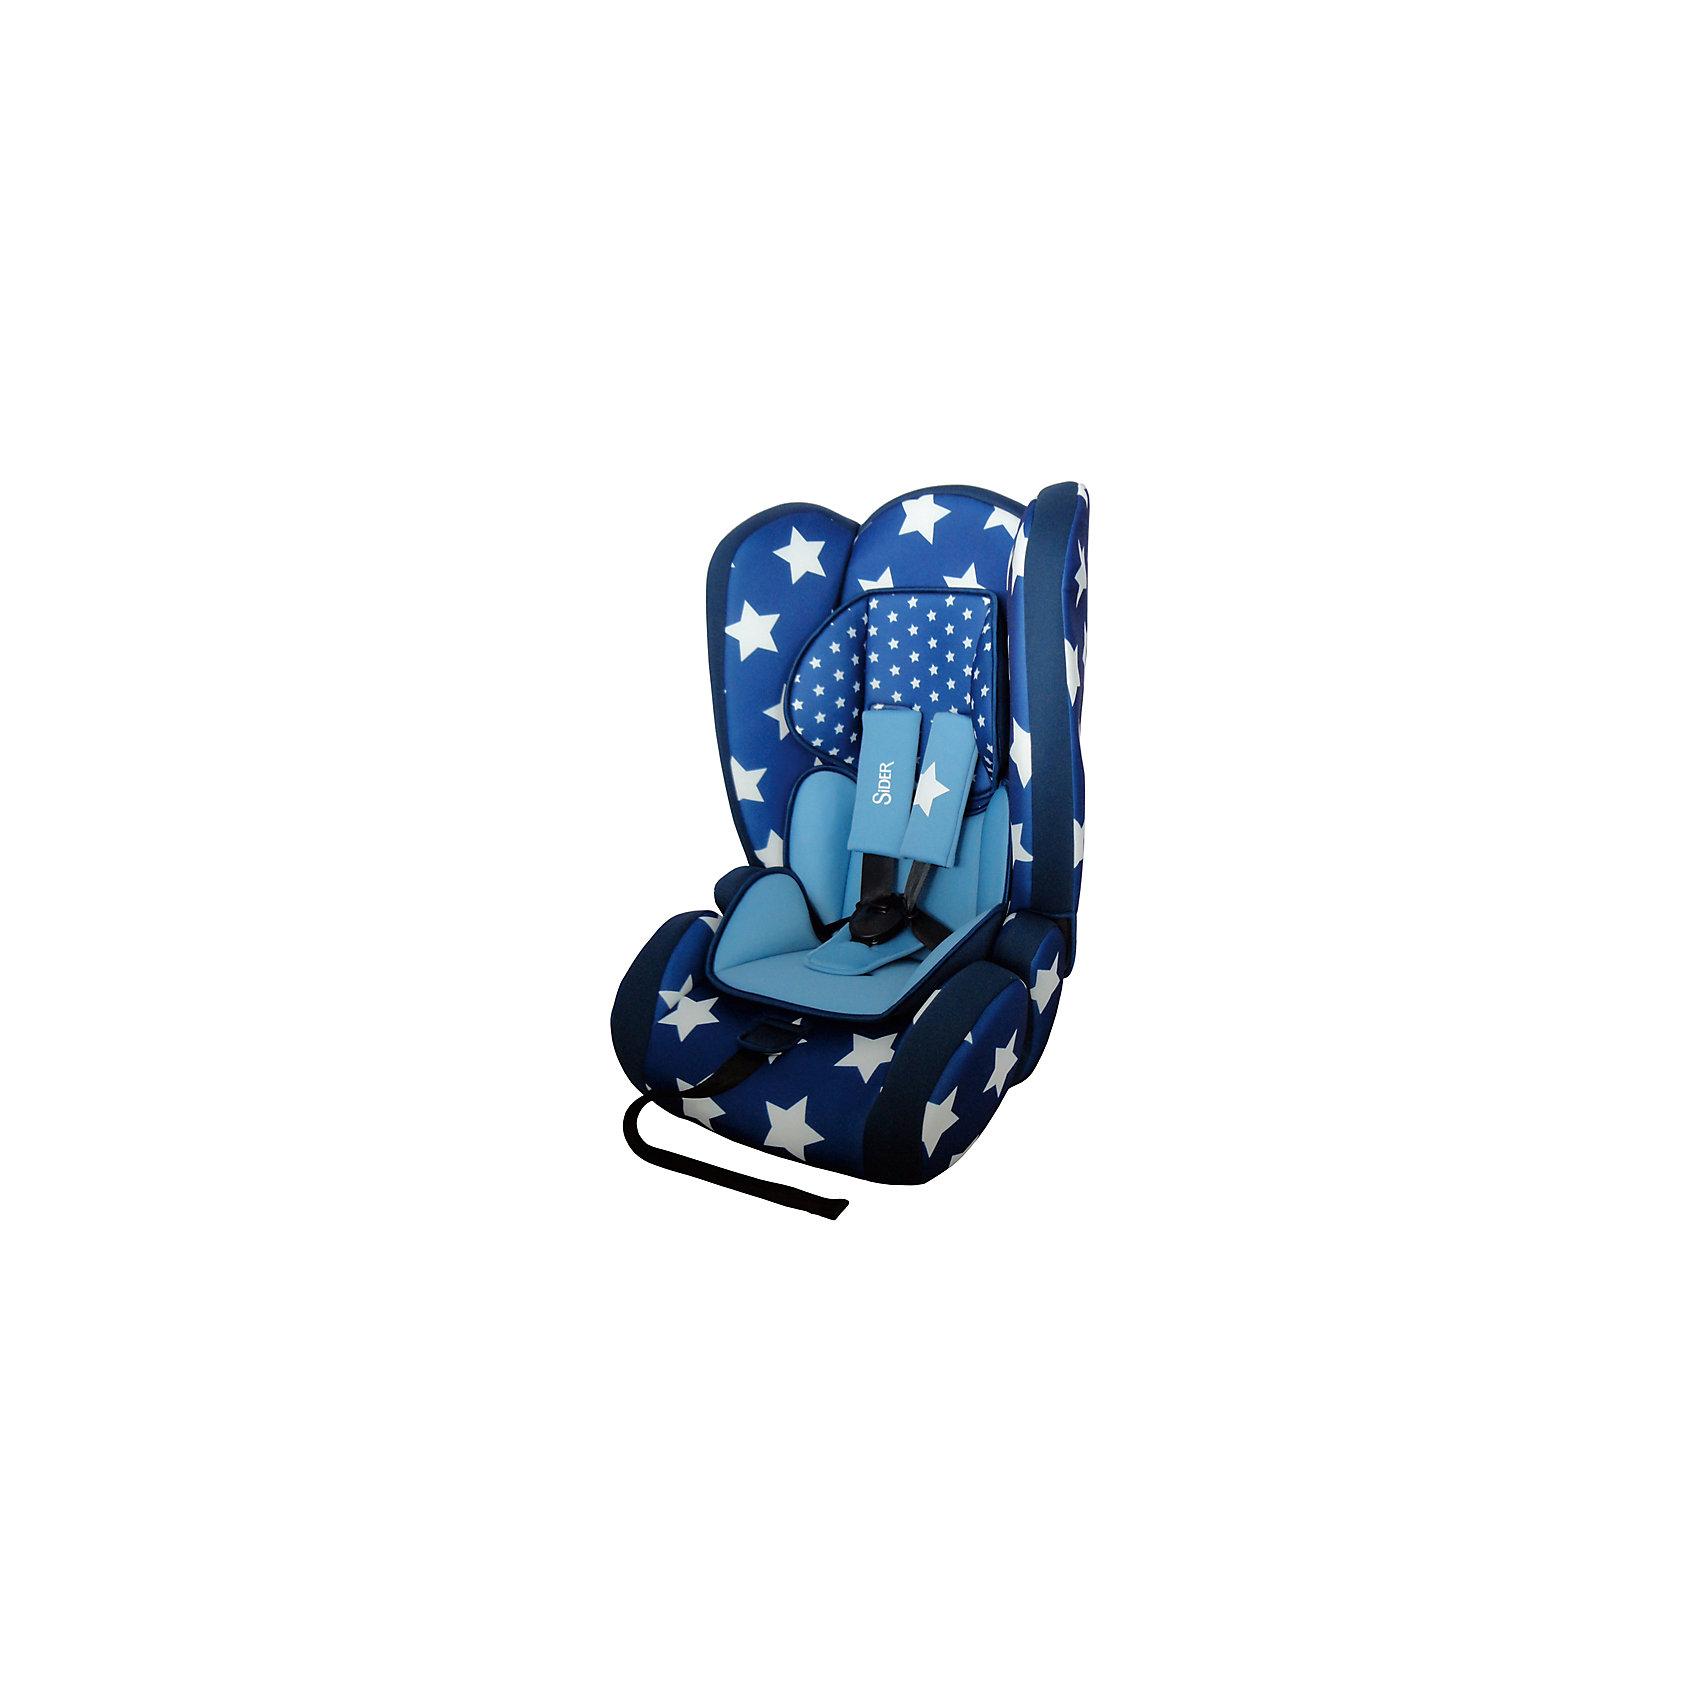 Автокресло Sider 9-36 кг., Babyhit, синий в белую звёздочку (Baby Hit)